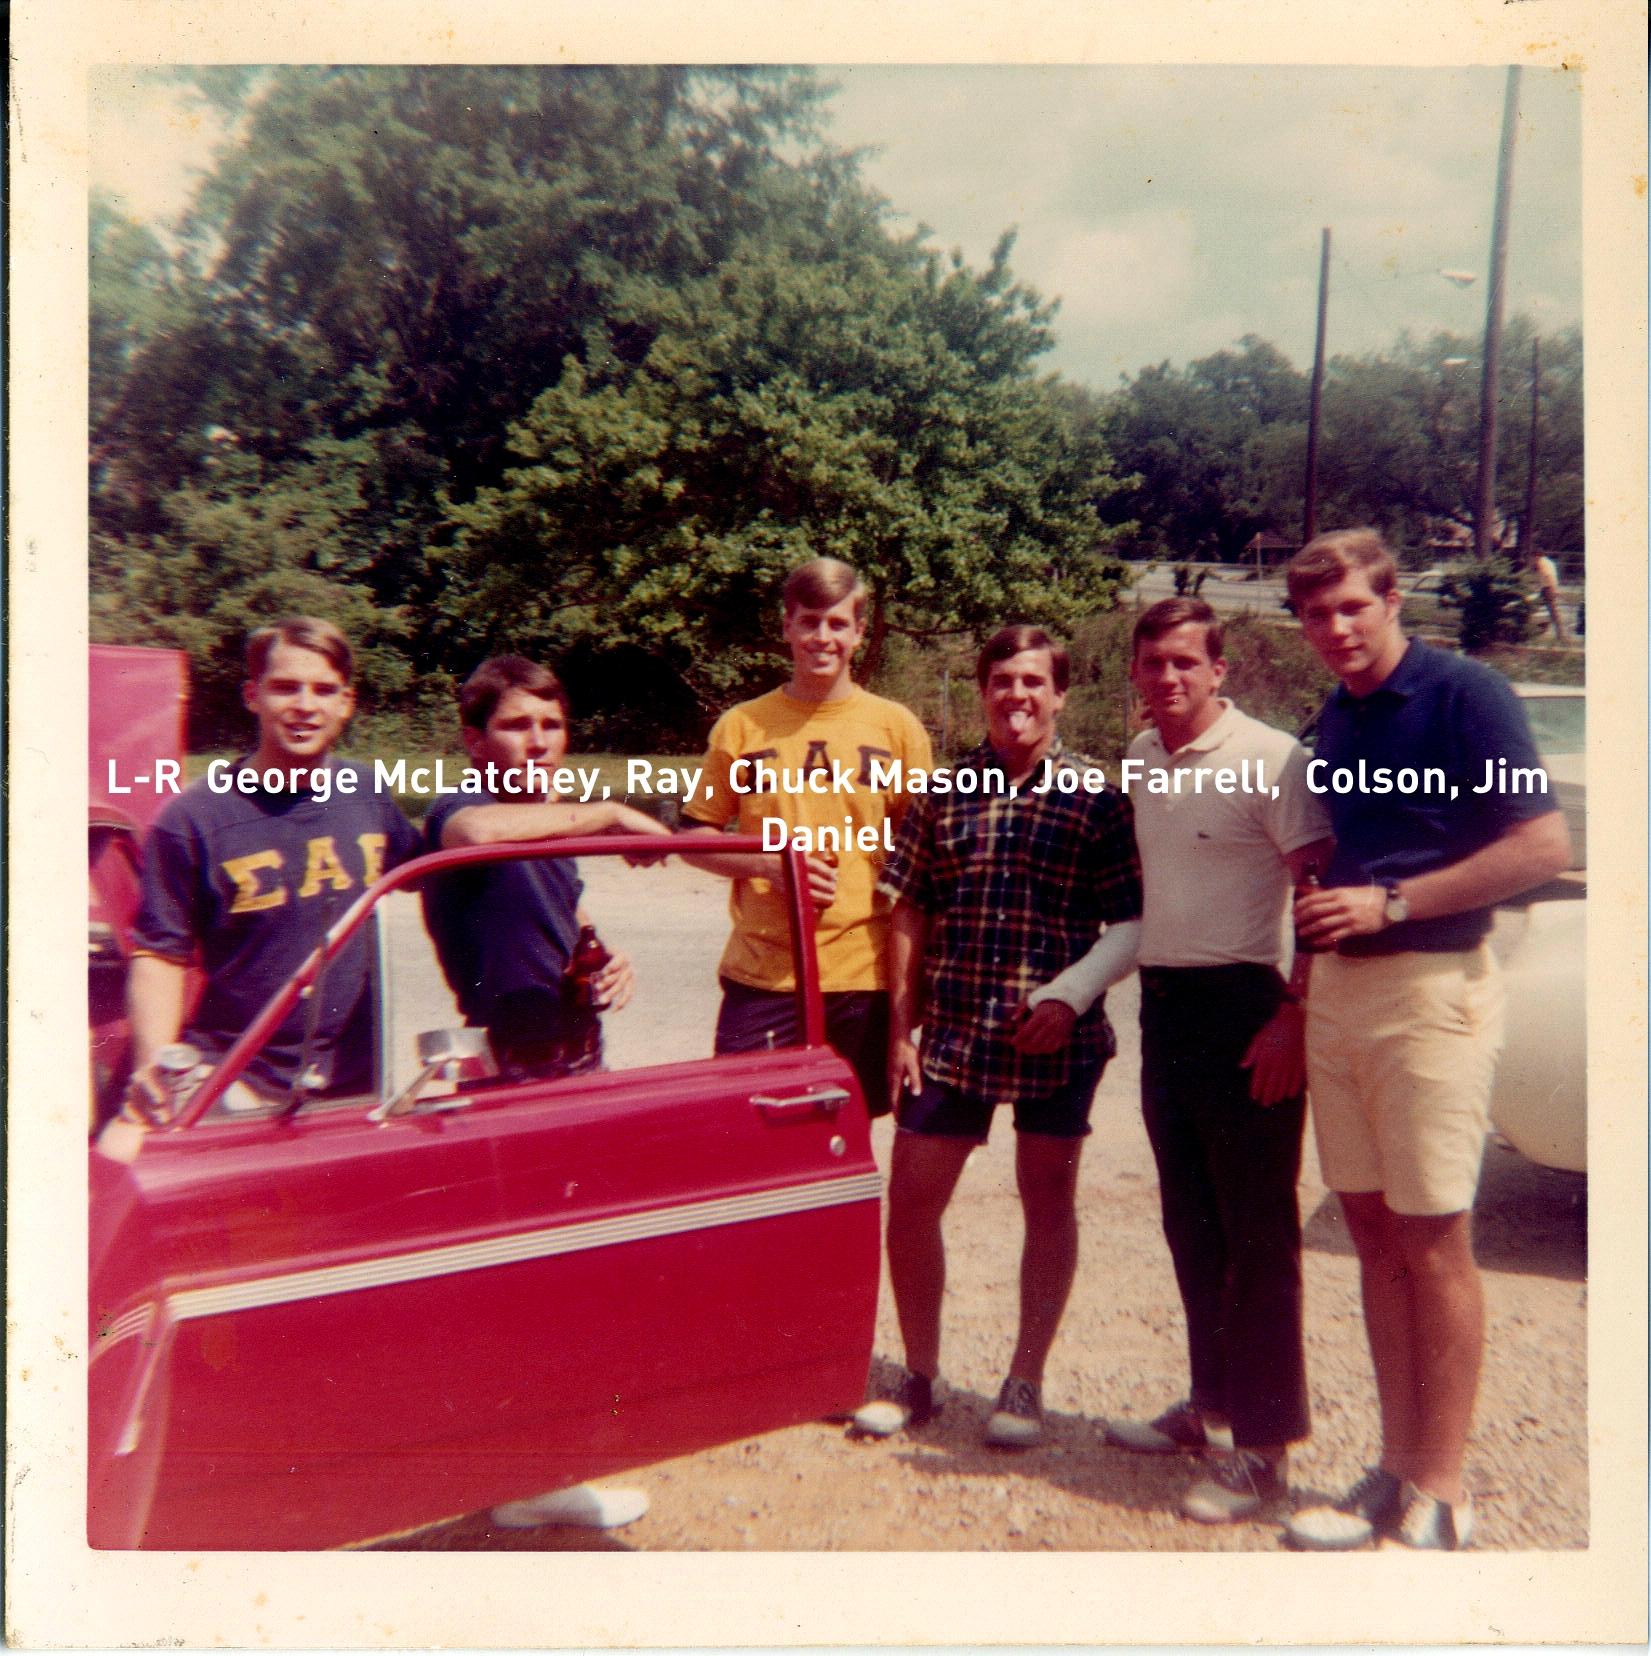 1962 George McLatchey, Ray, Chuck Mason, Joe Farrell, Colson, Jim Daniel.jpg